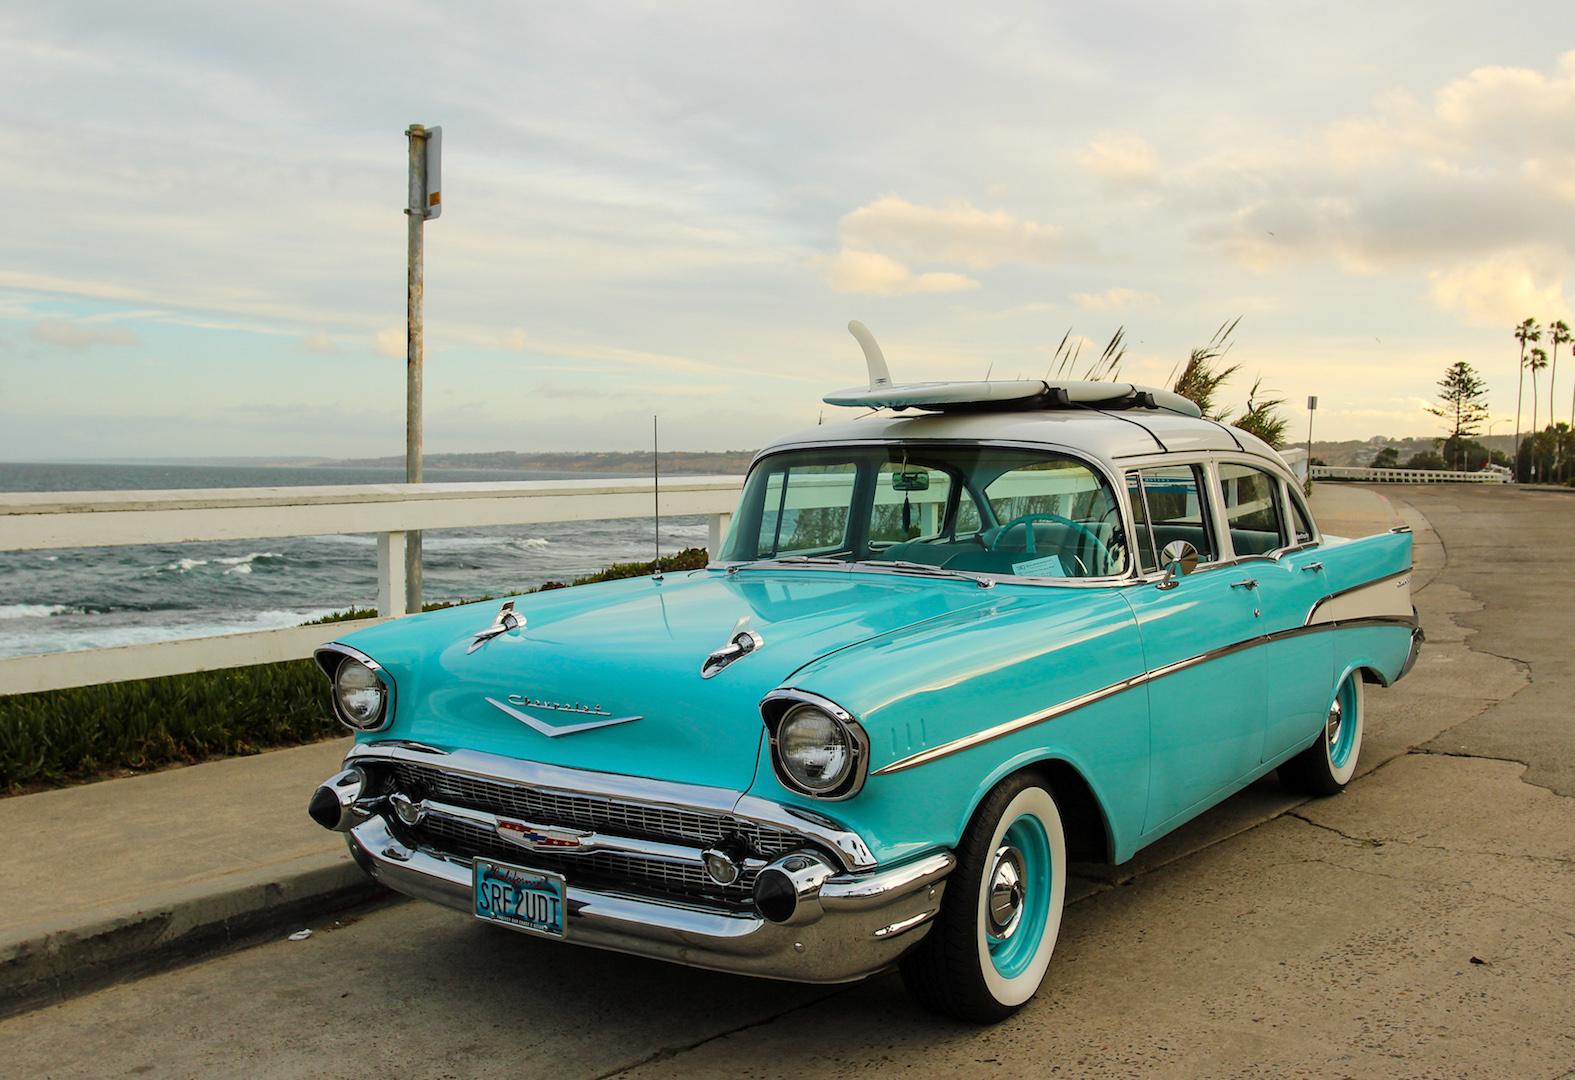 Baby Blue 1957 Chevy Seaside in La Jolla, San Diego, CA